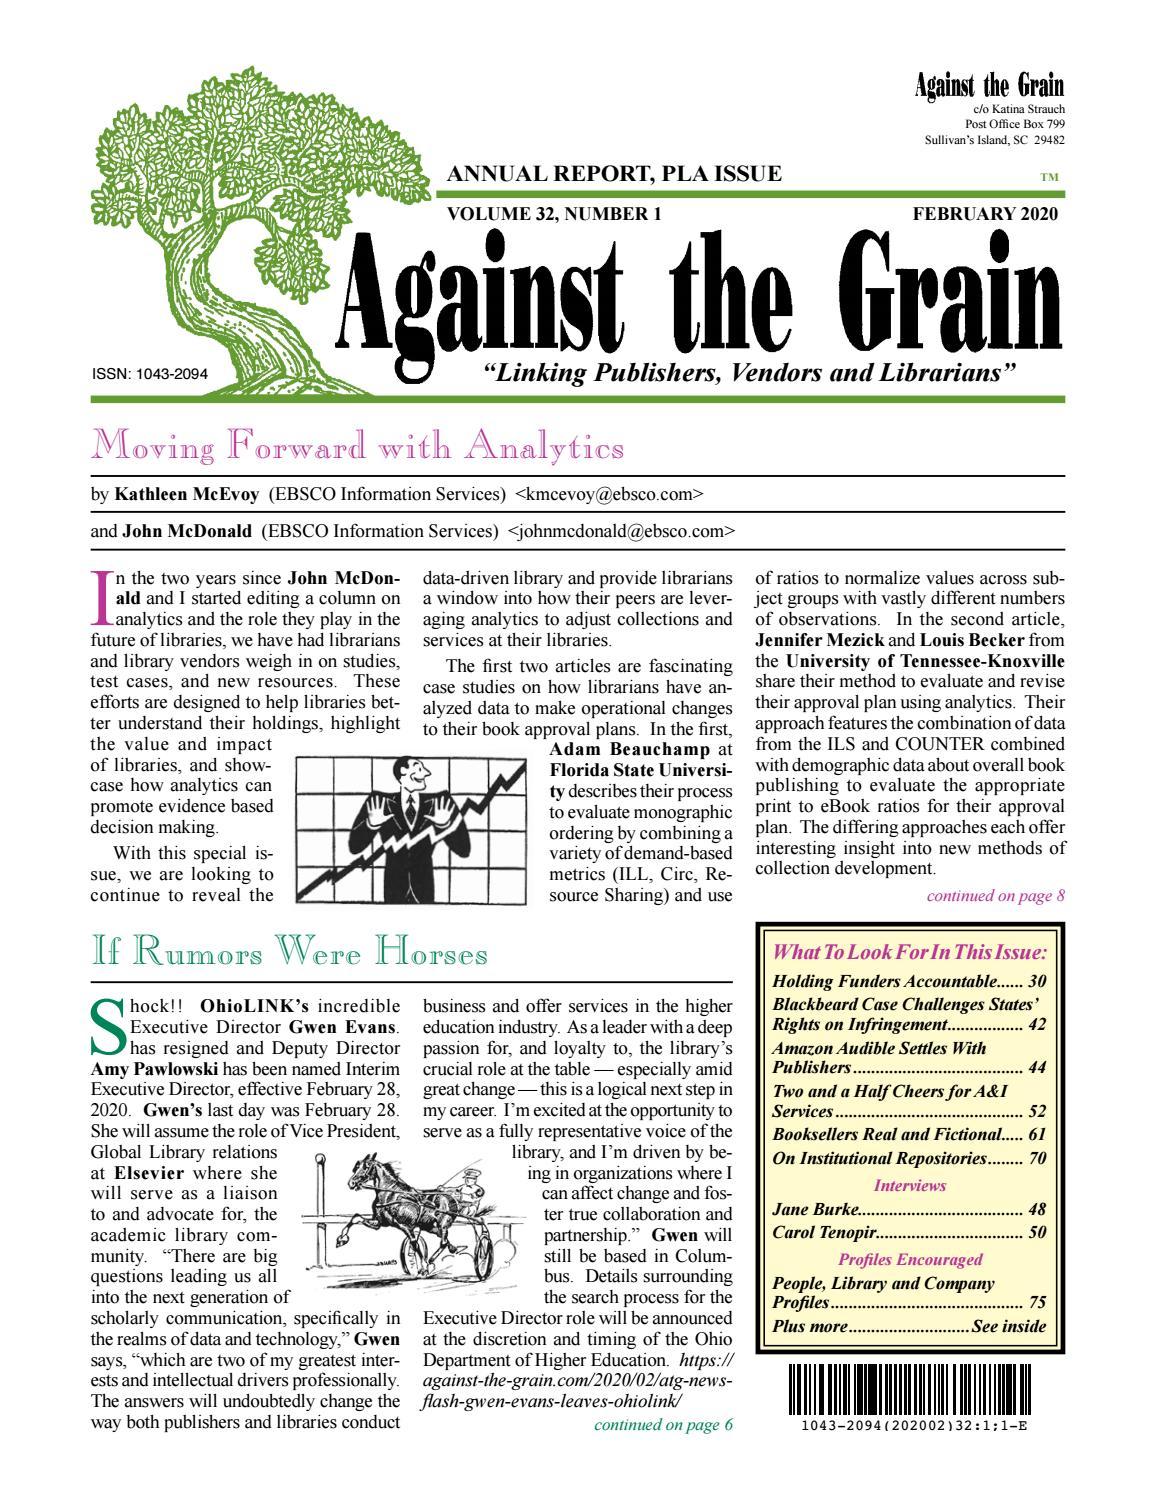 Against The Grain V32 #1 February 2020Against The Grain Regarding Mifflin County School Ddistrict Calendar 2021 2020